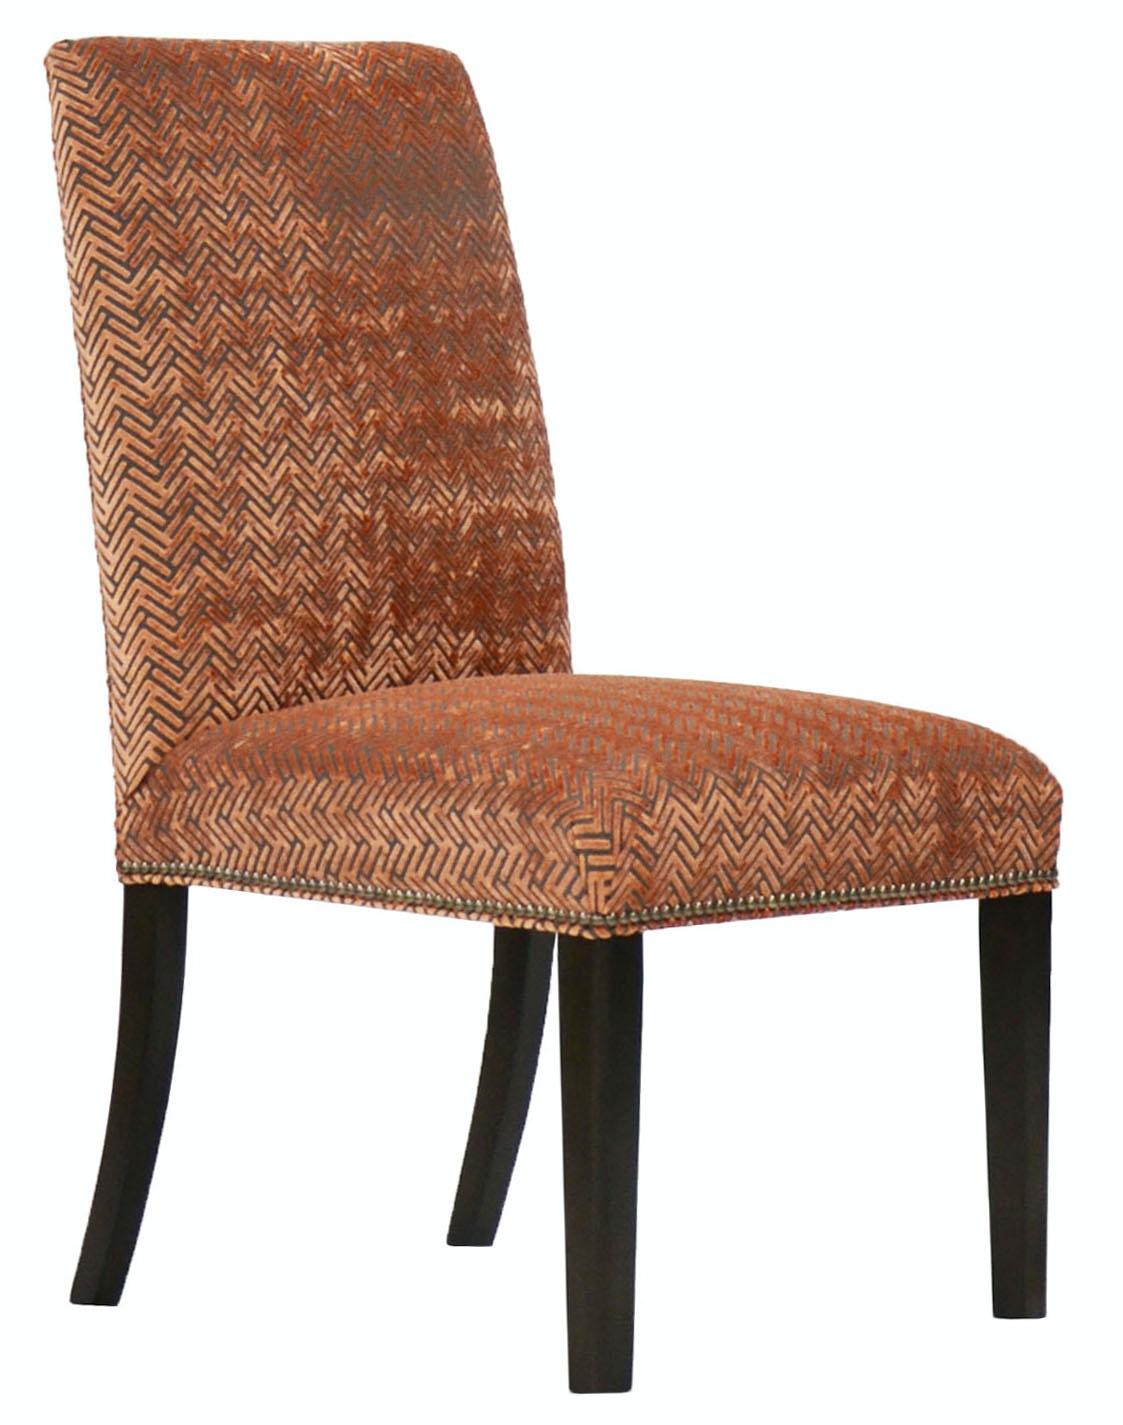 Vanguard Furniture Michael Weiss Bailey Side Chair Vanguard W722S